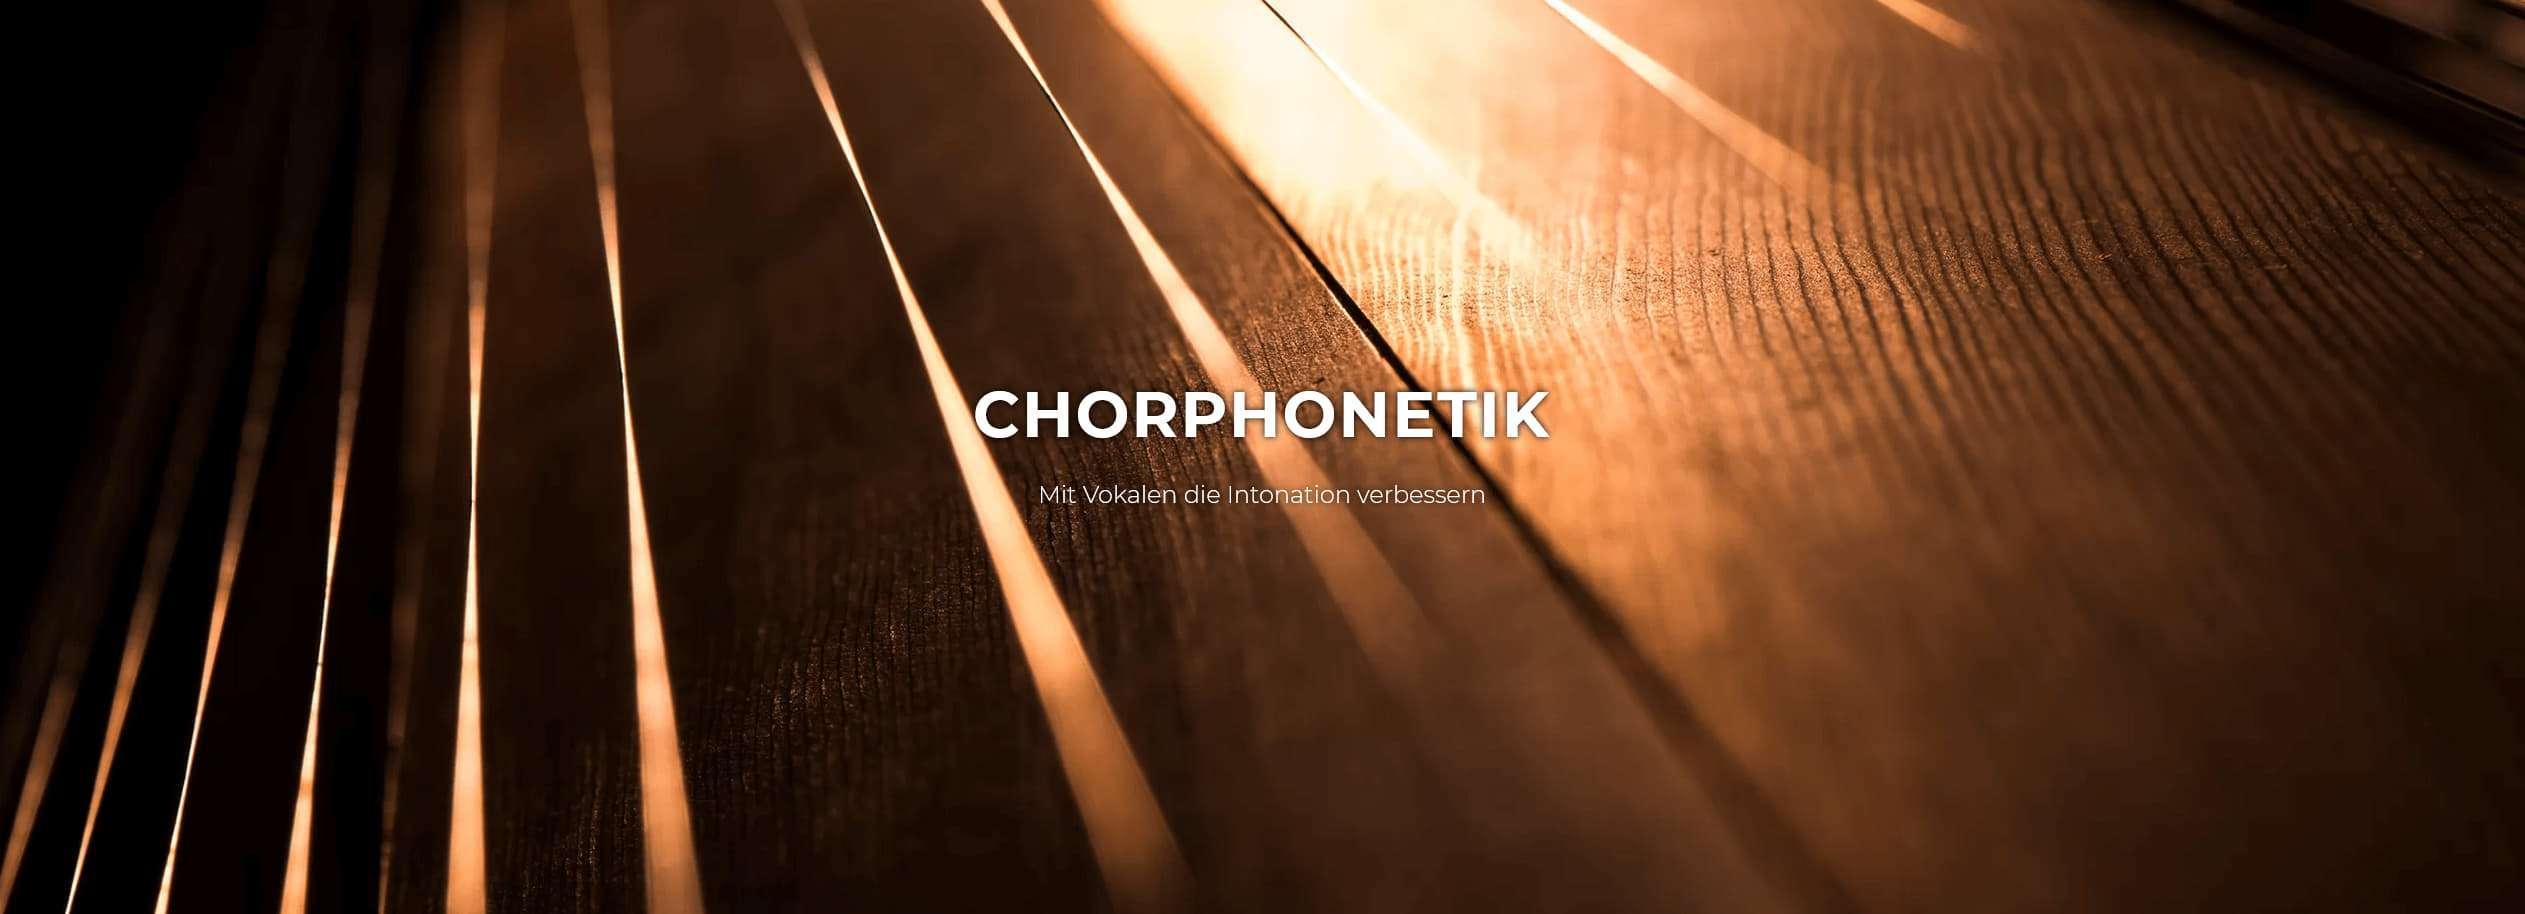 Chorphonetik Worskhop Klangwelt Swiss